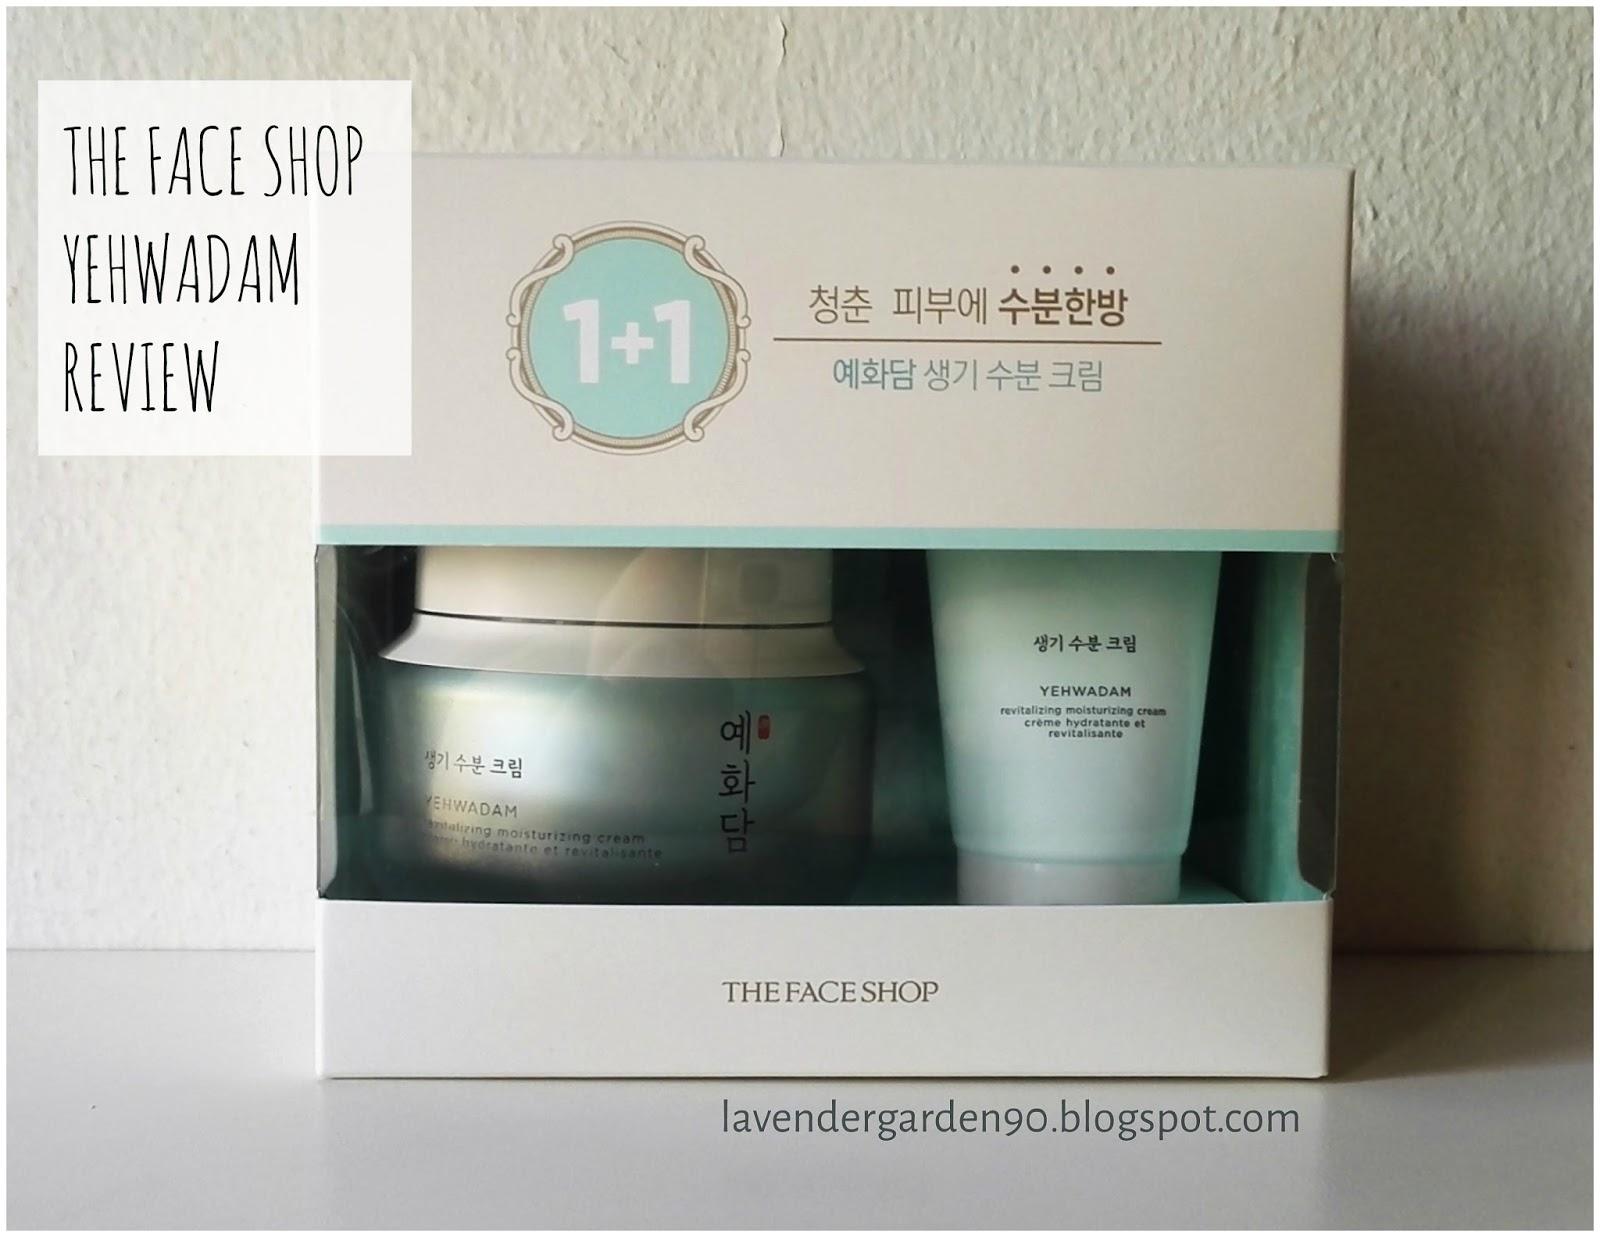 The True Cream Aqua Bomb by belif #6